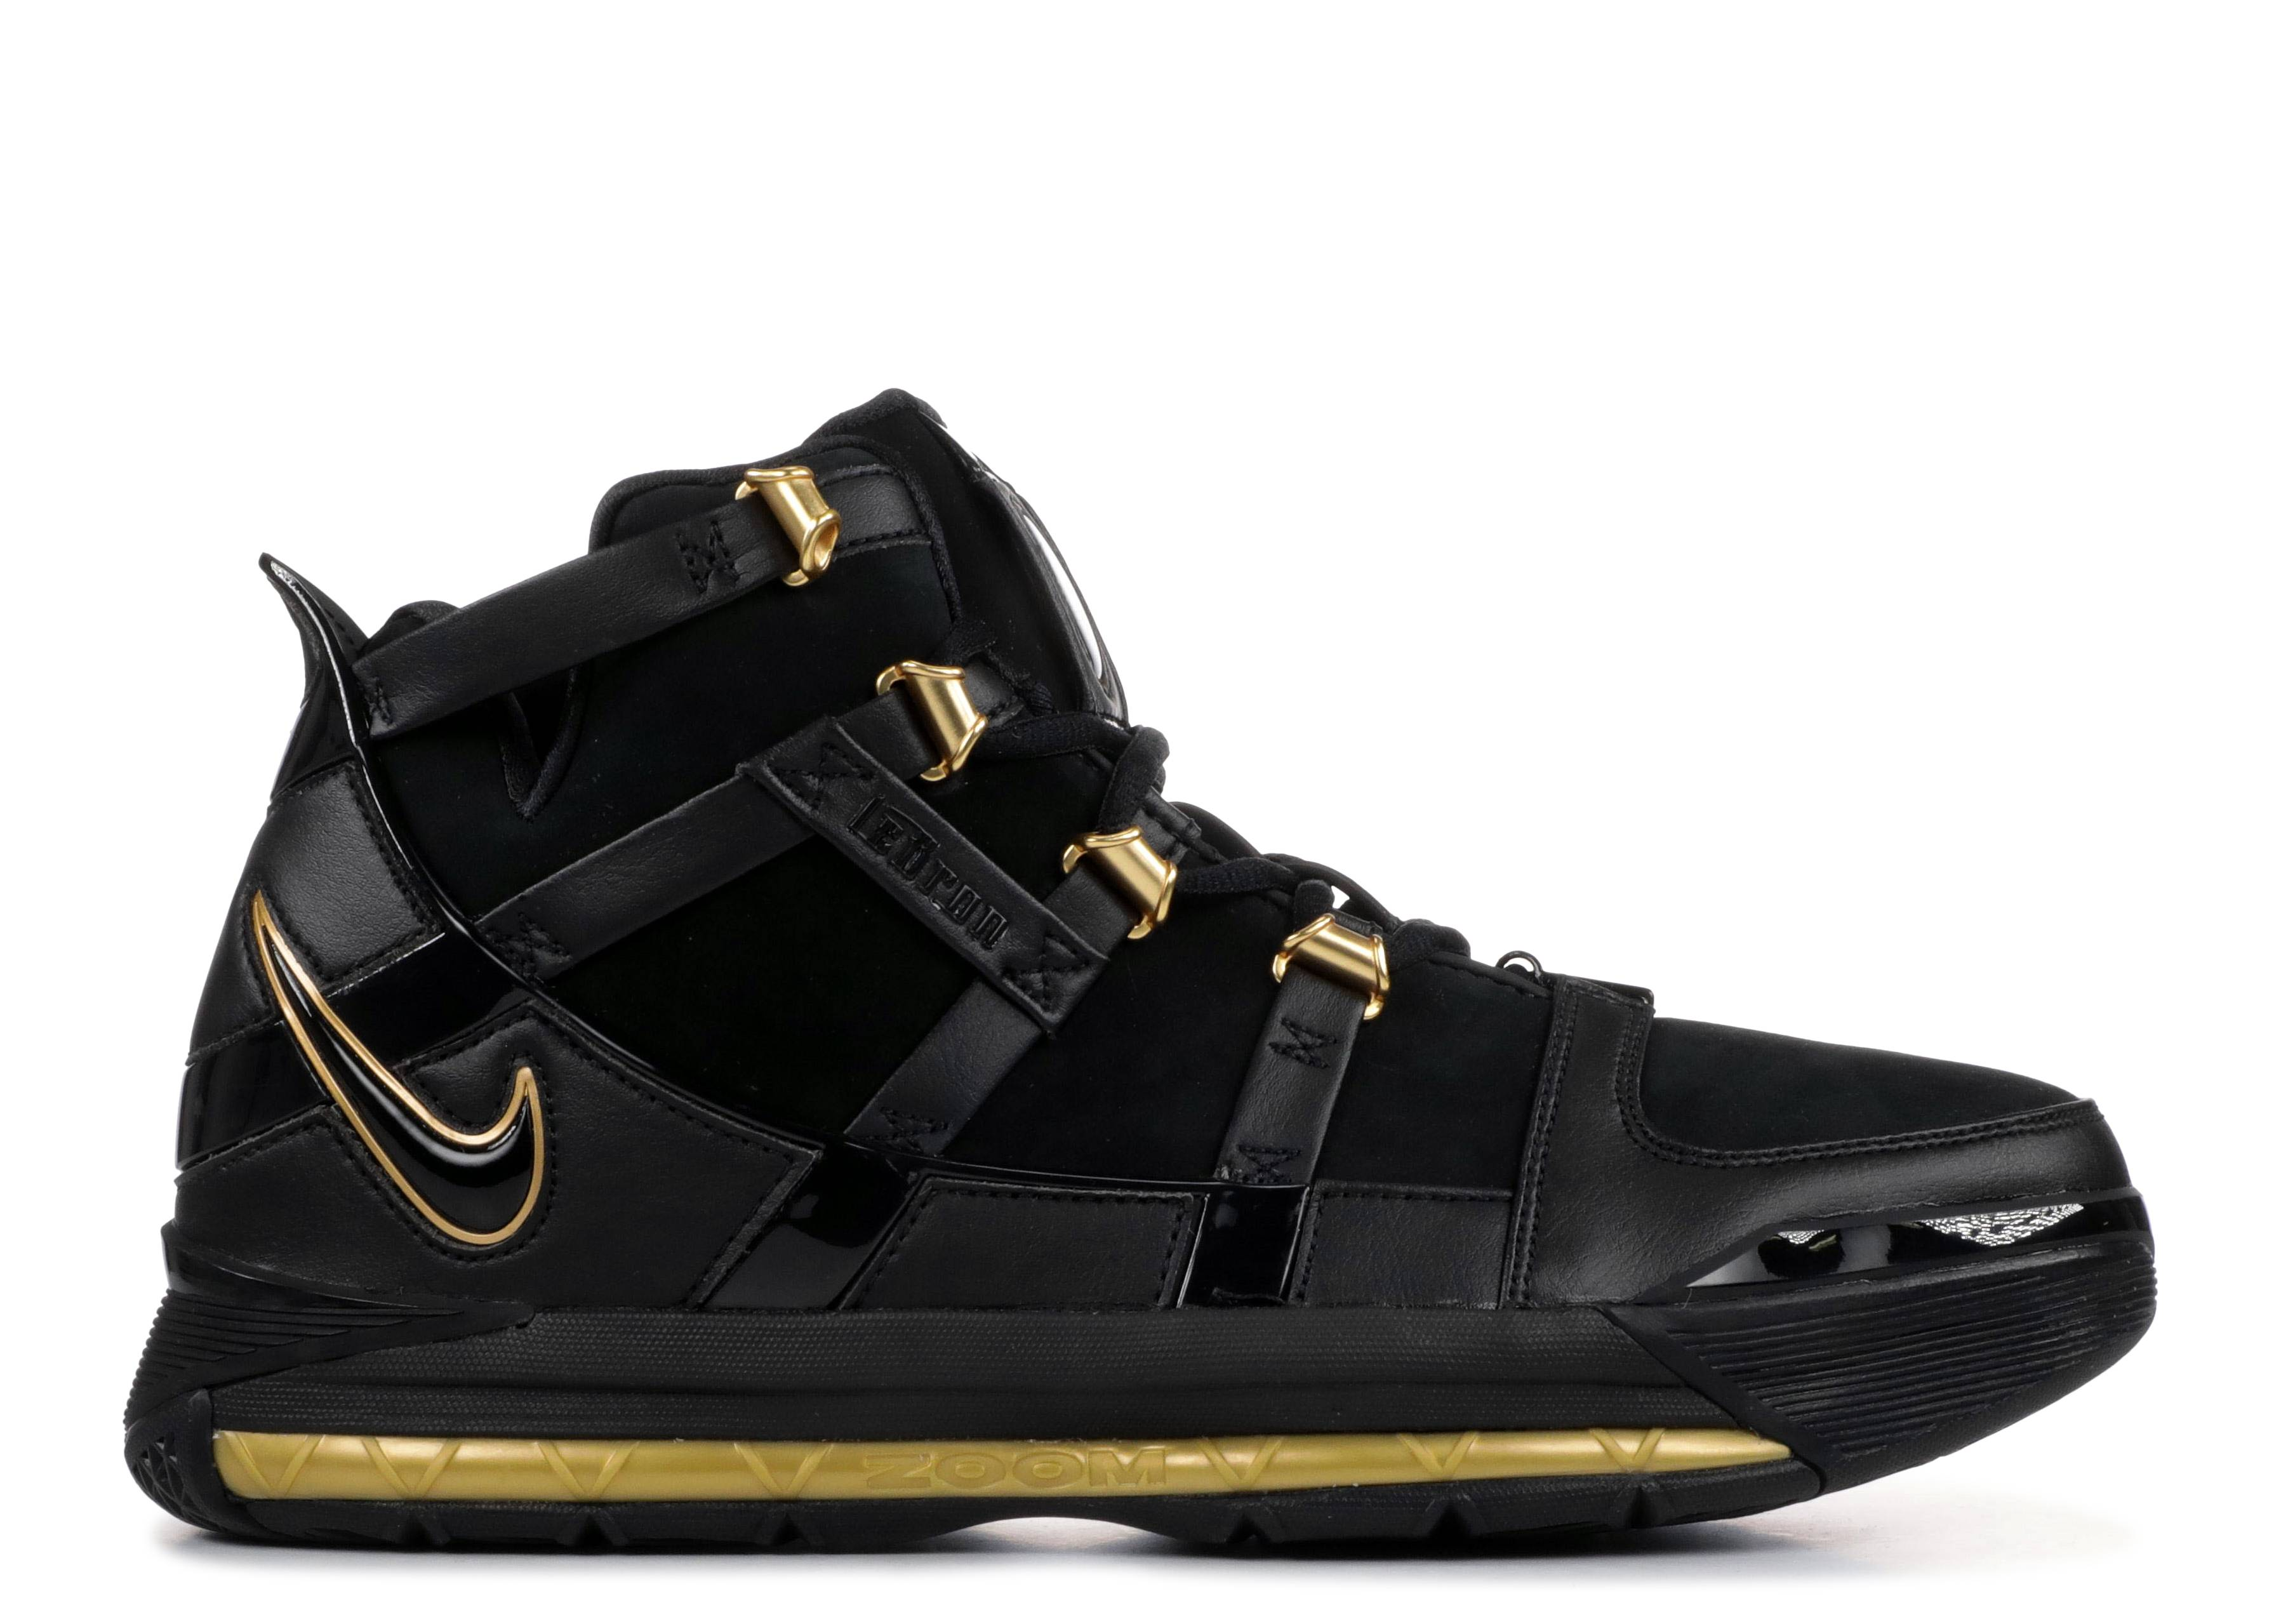 4eb3d2565e6 Zoom Lebron 3 Qs - Nike - ao2434 001 - black black-metallic gold ...